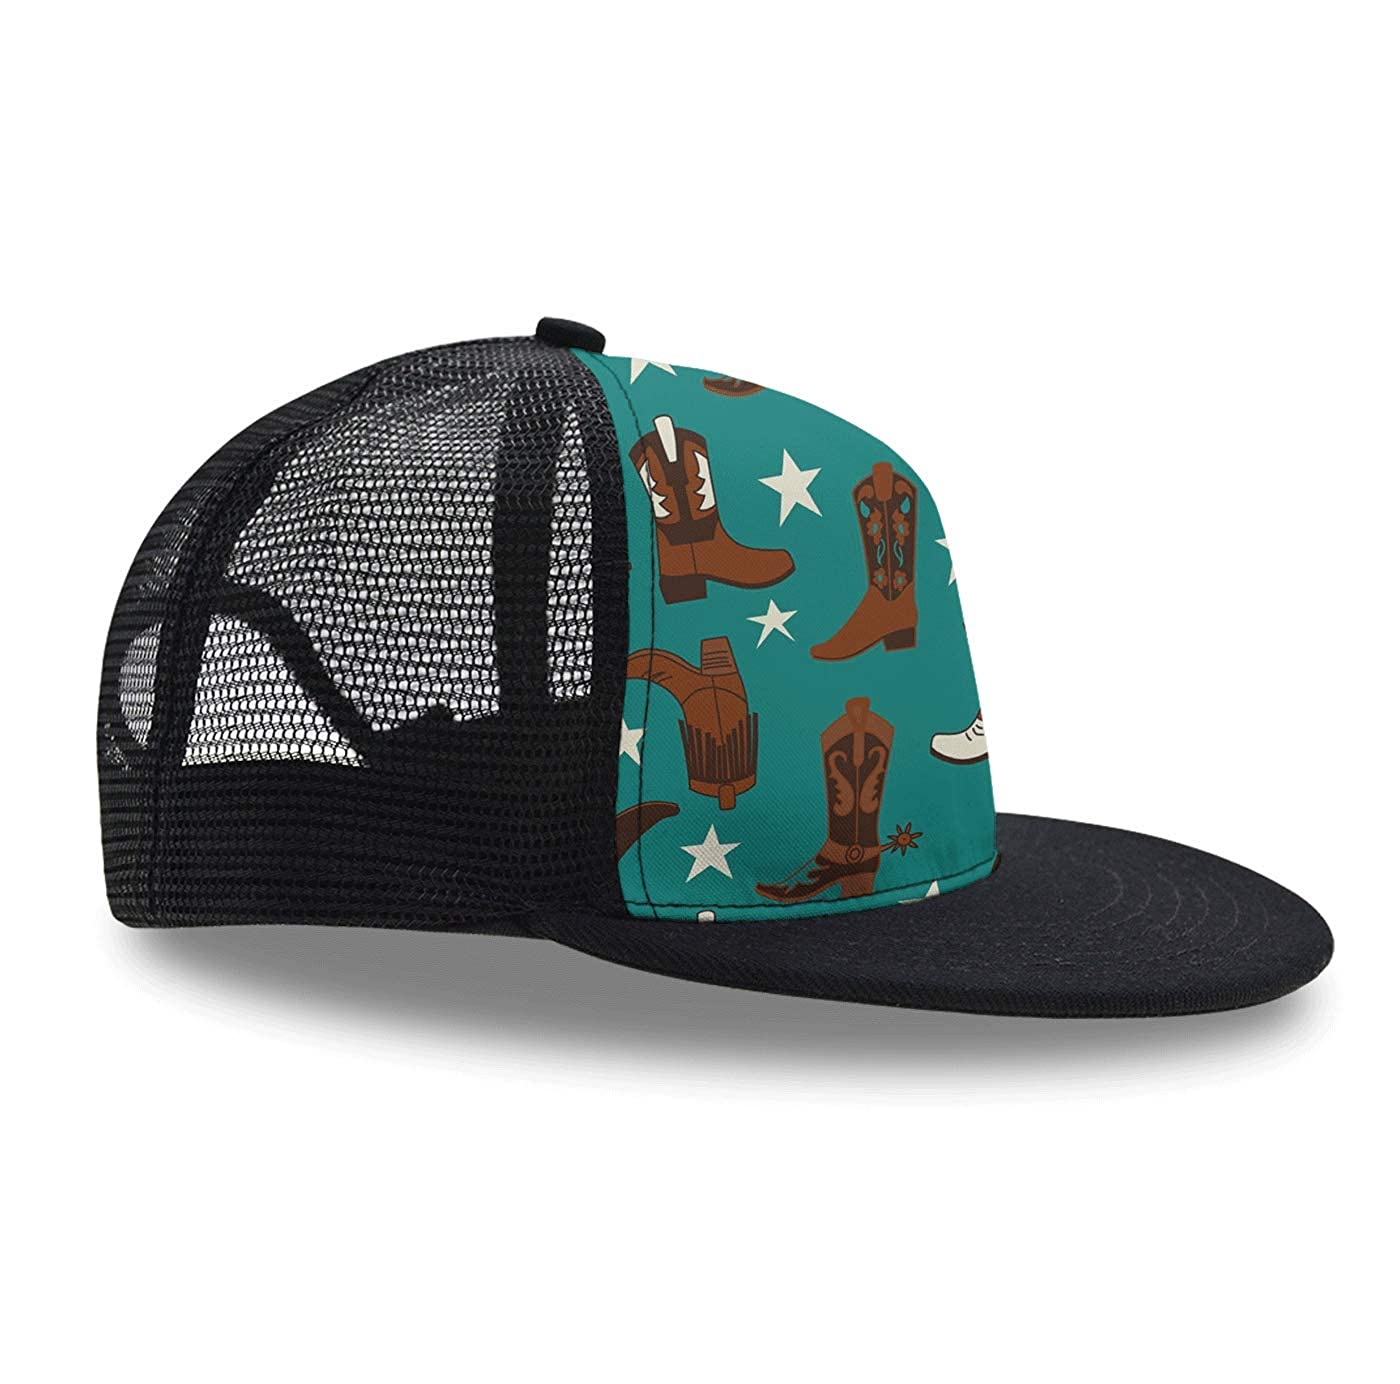 1caf5a30539 Amazon.com: Classic Baseball Caps Teal Cowboy Boots Boy Girl ...